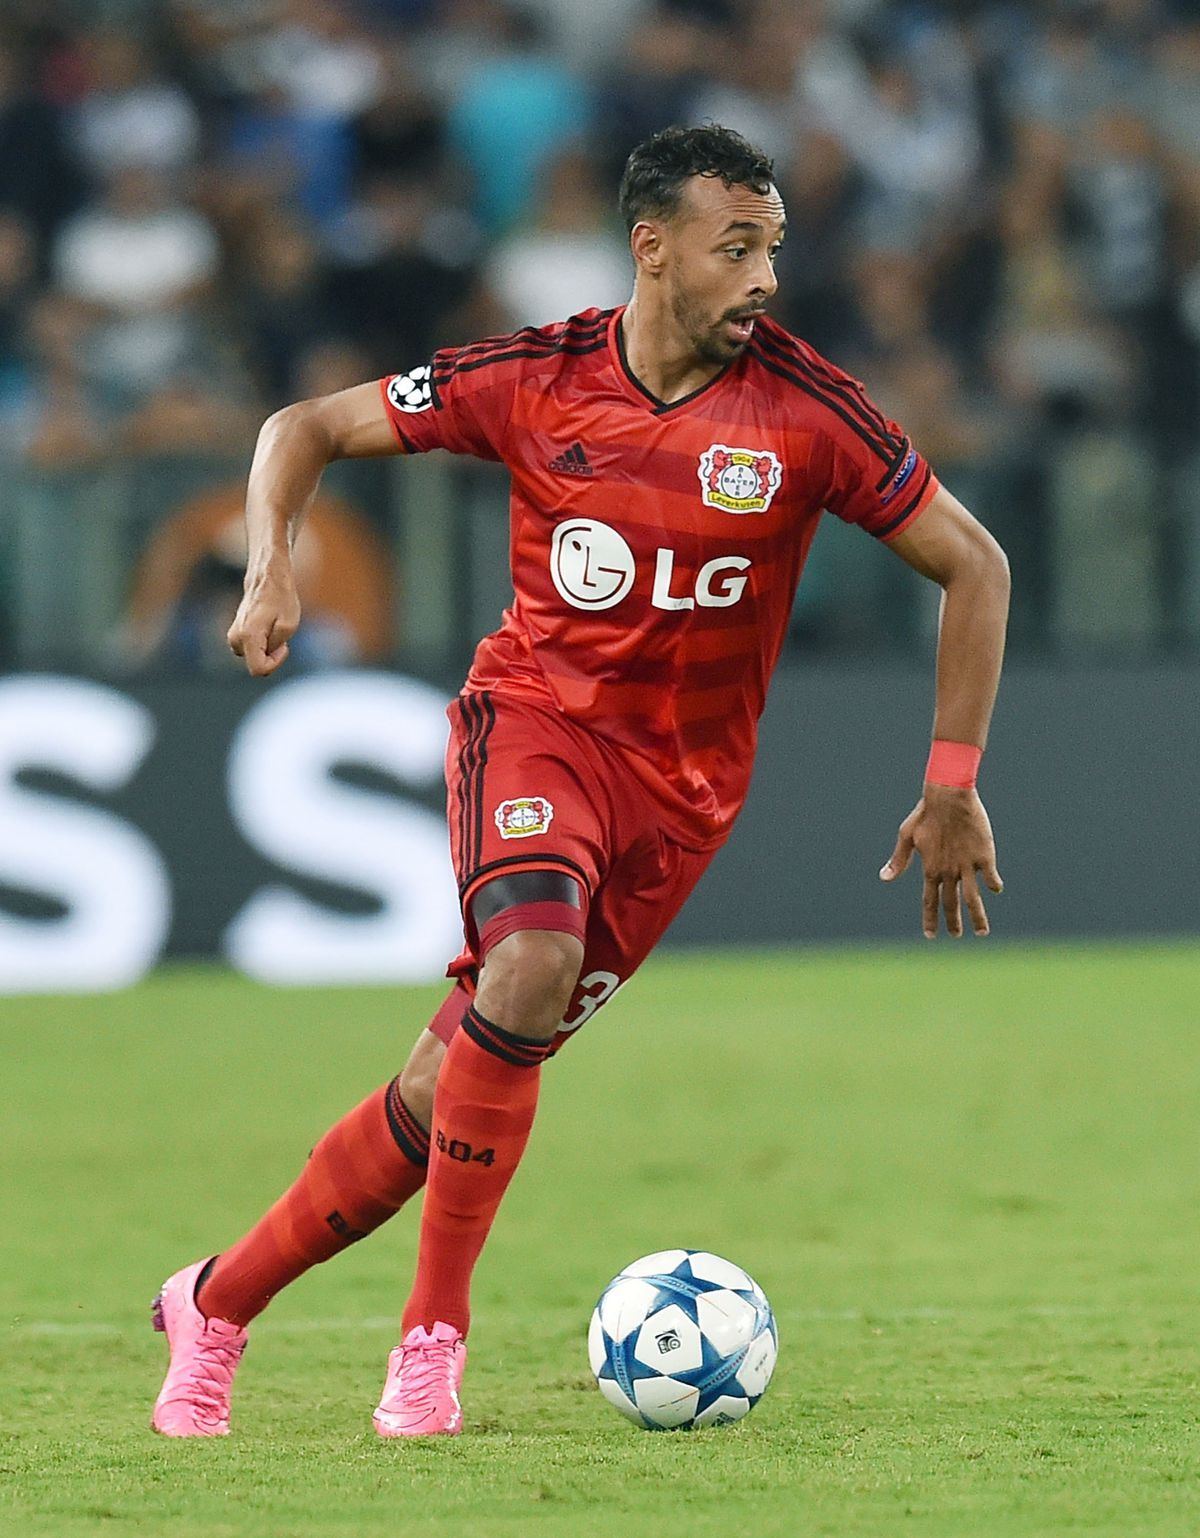 SS Lazio v Bayer Leverkusen - UEFA Champions League: Qualifying Round Play Off First Leg